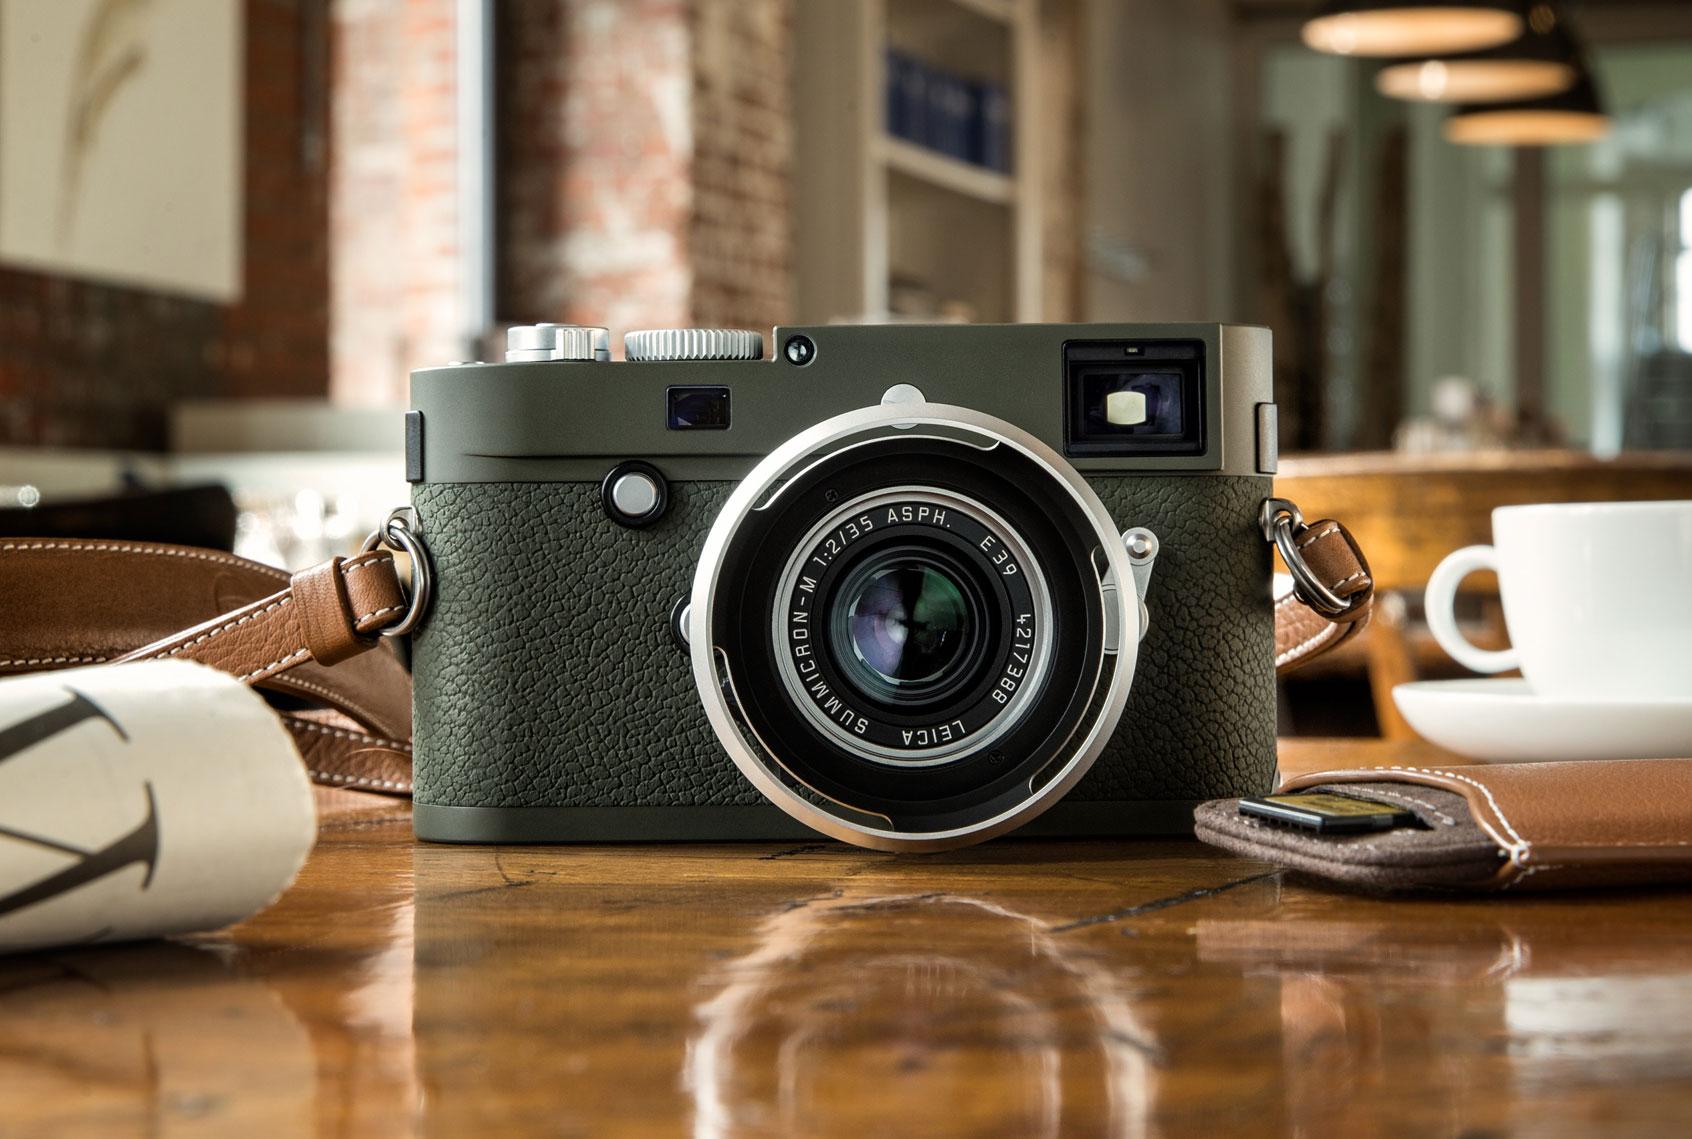 Leica Camera Launch Limited-edition, Olive Green 'Safari' Camera 3